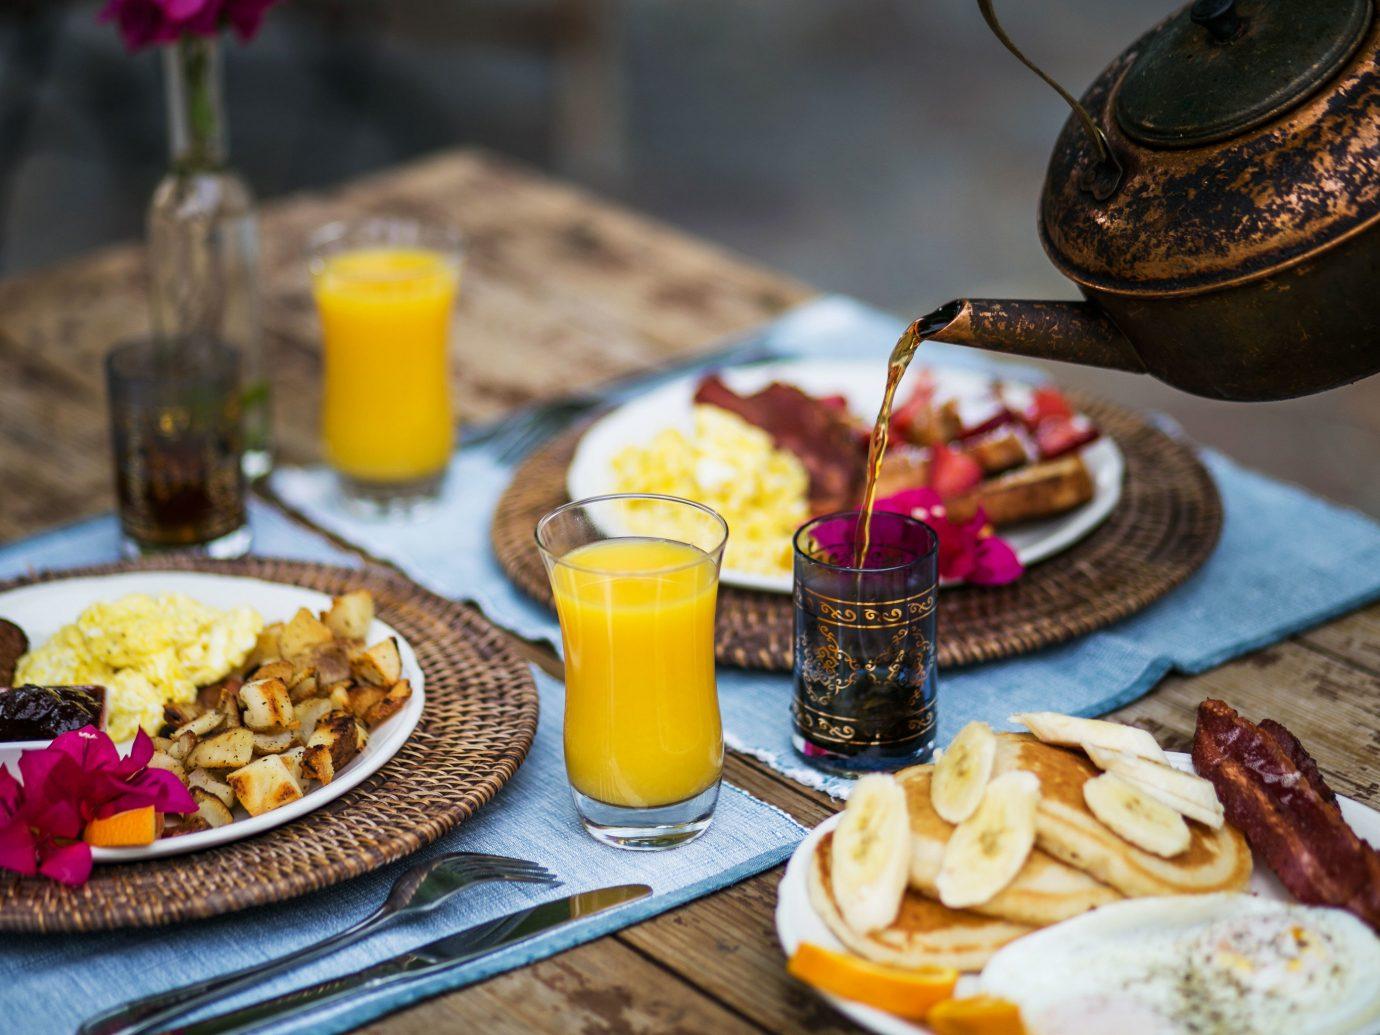 Editors Picks Hotels Luxury Travel Romance Trip Ideas table food plate dish meal breakfast brunch lunch produce sense dinner restaurant